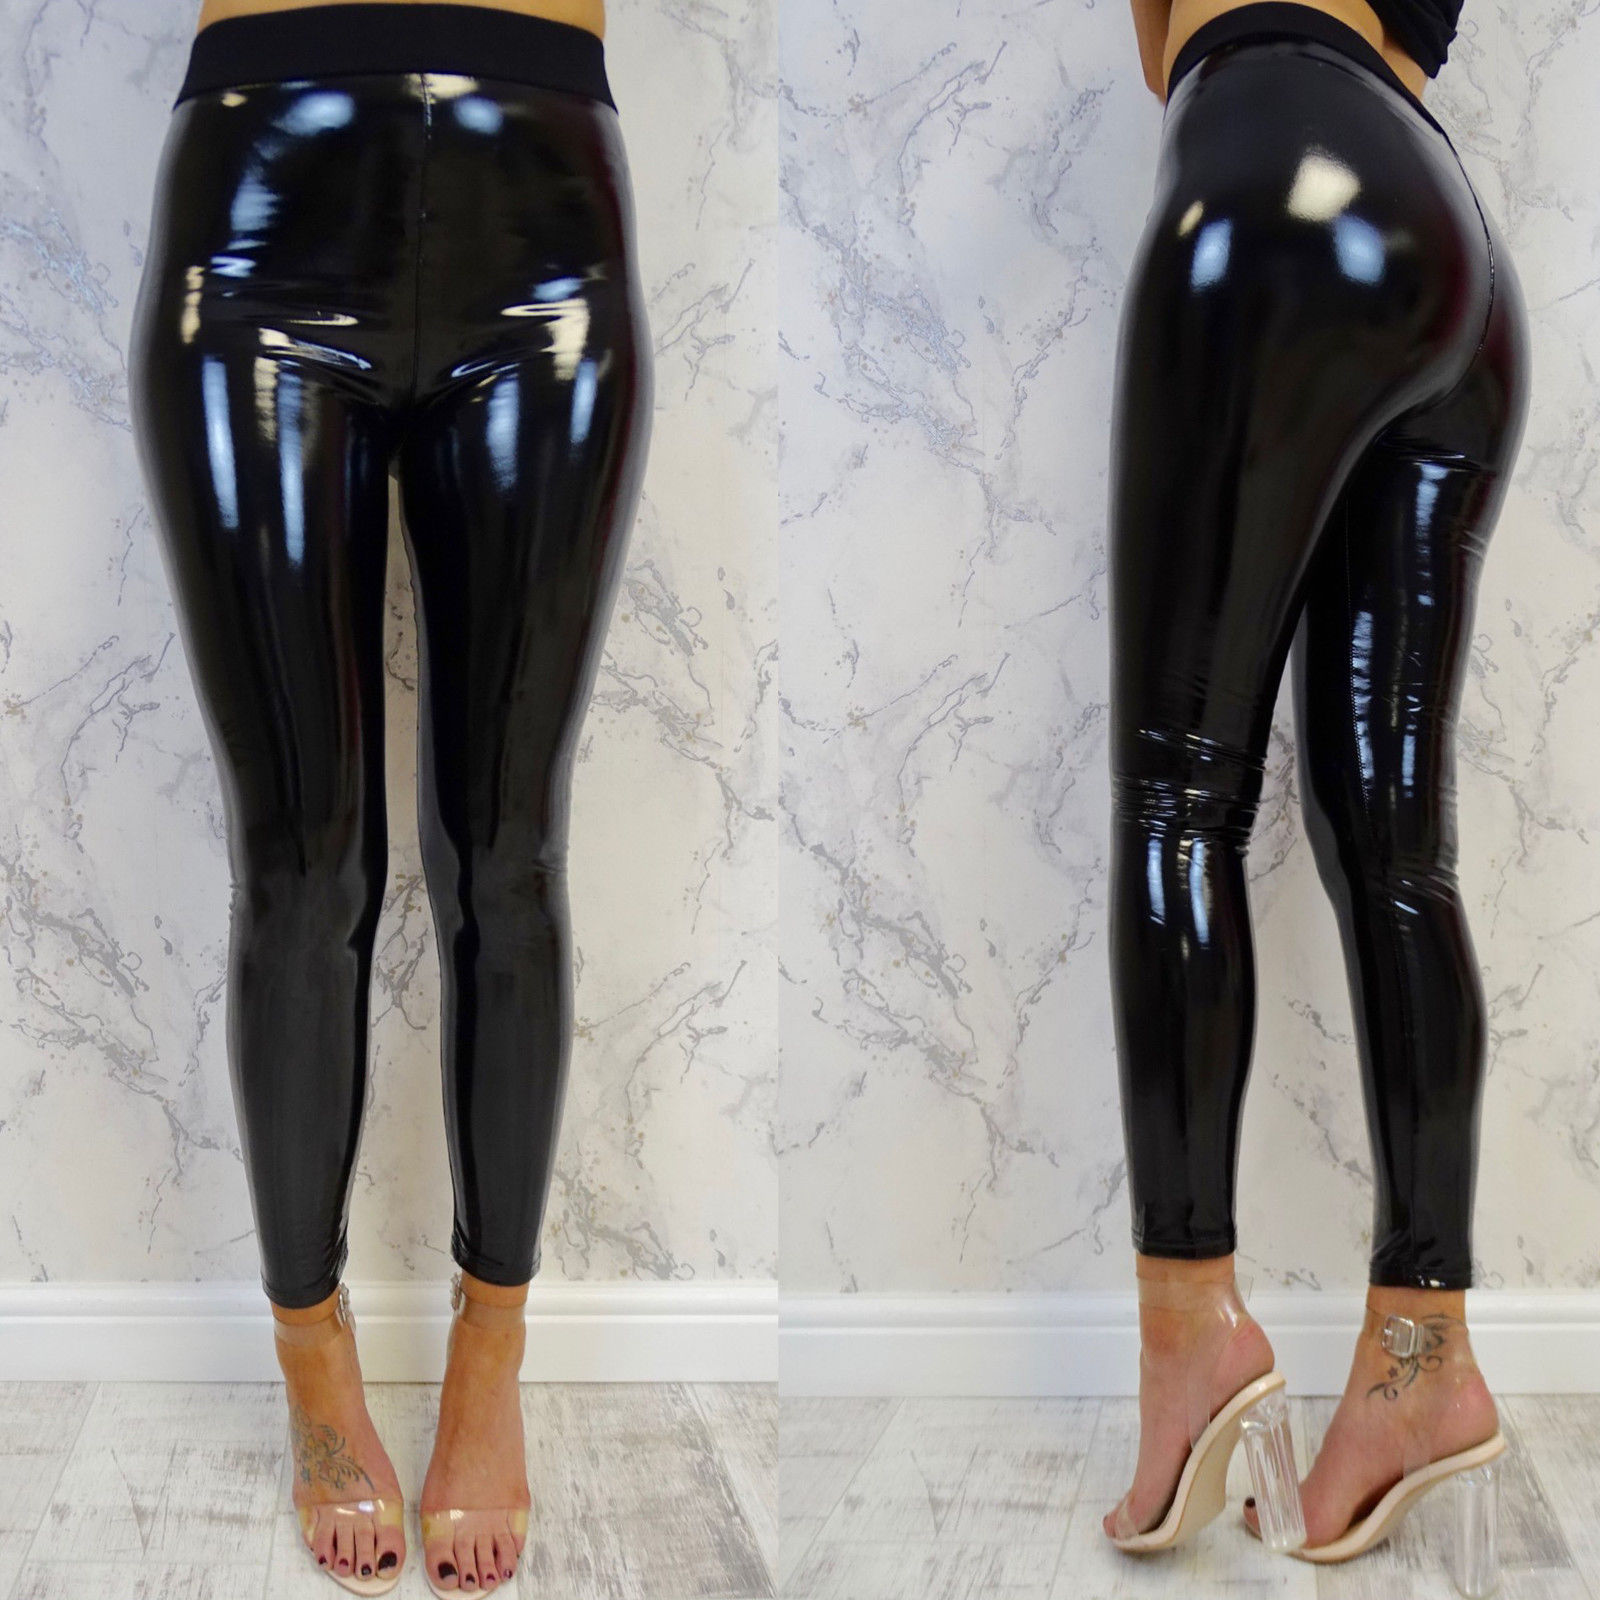 Gothic Stretch Shiny Wet Look PU Leather Leggings Women Black Slim Push Up Long Pants Ladies Sexy Skinny Leggings 1